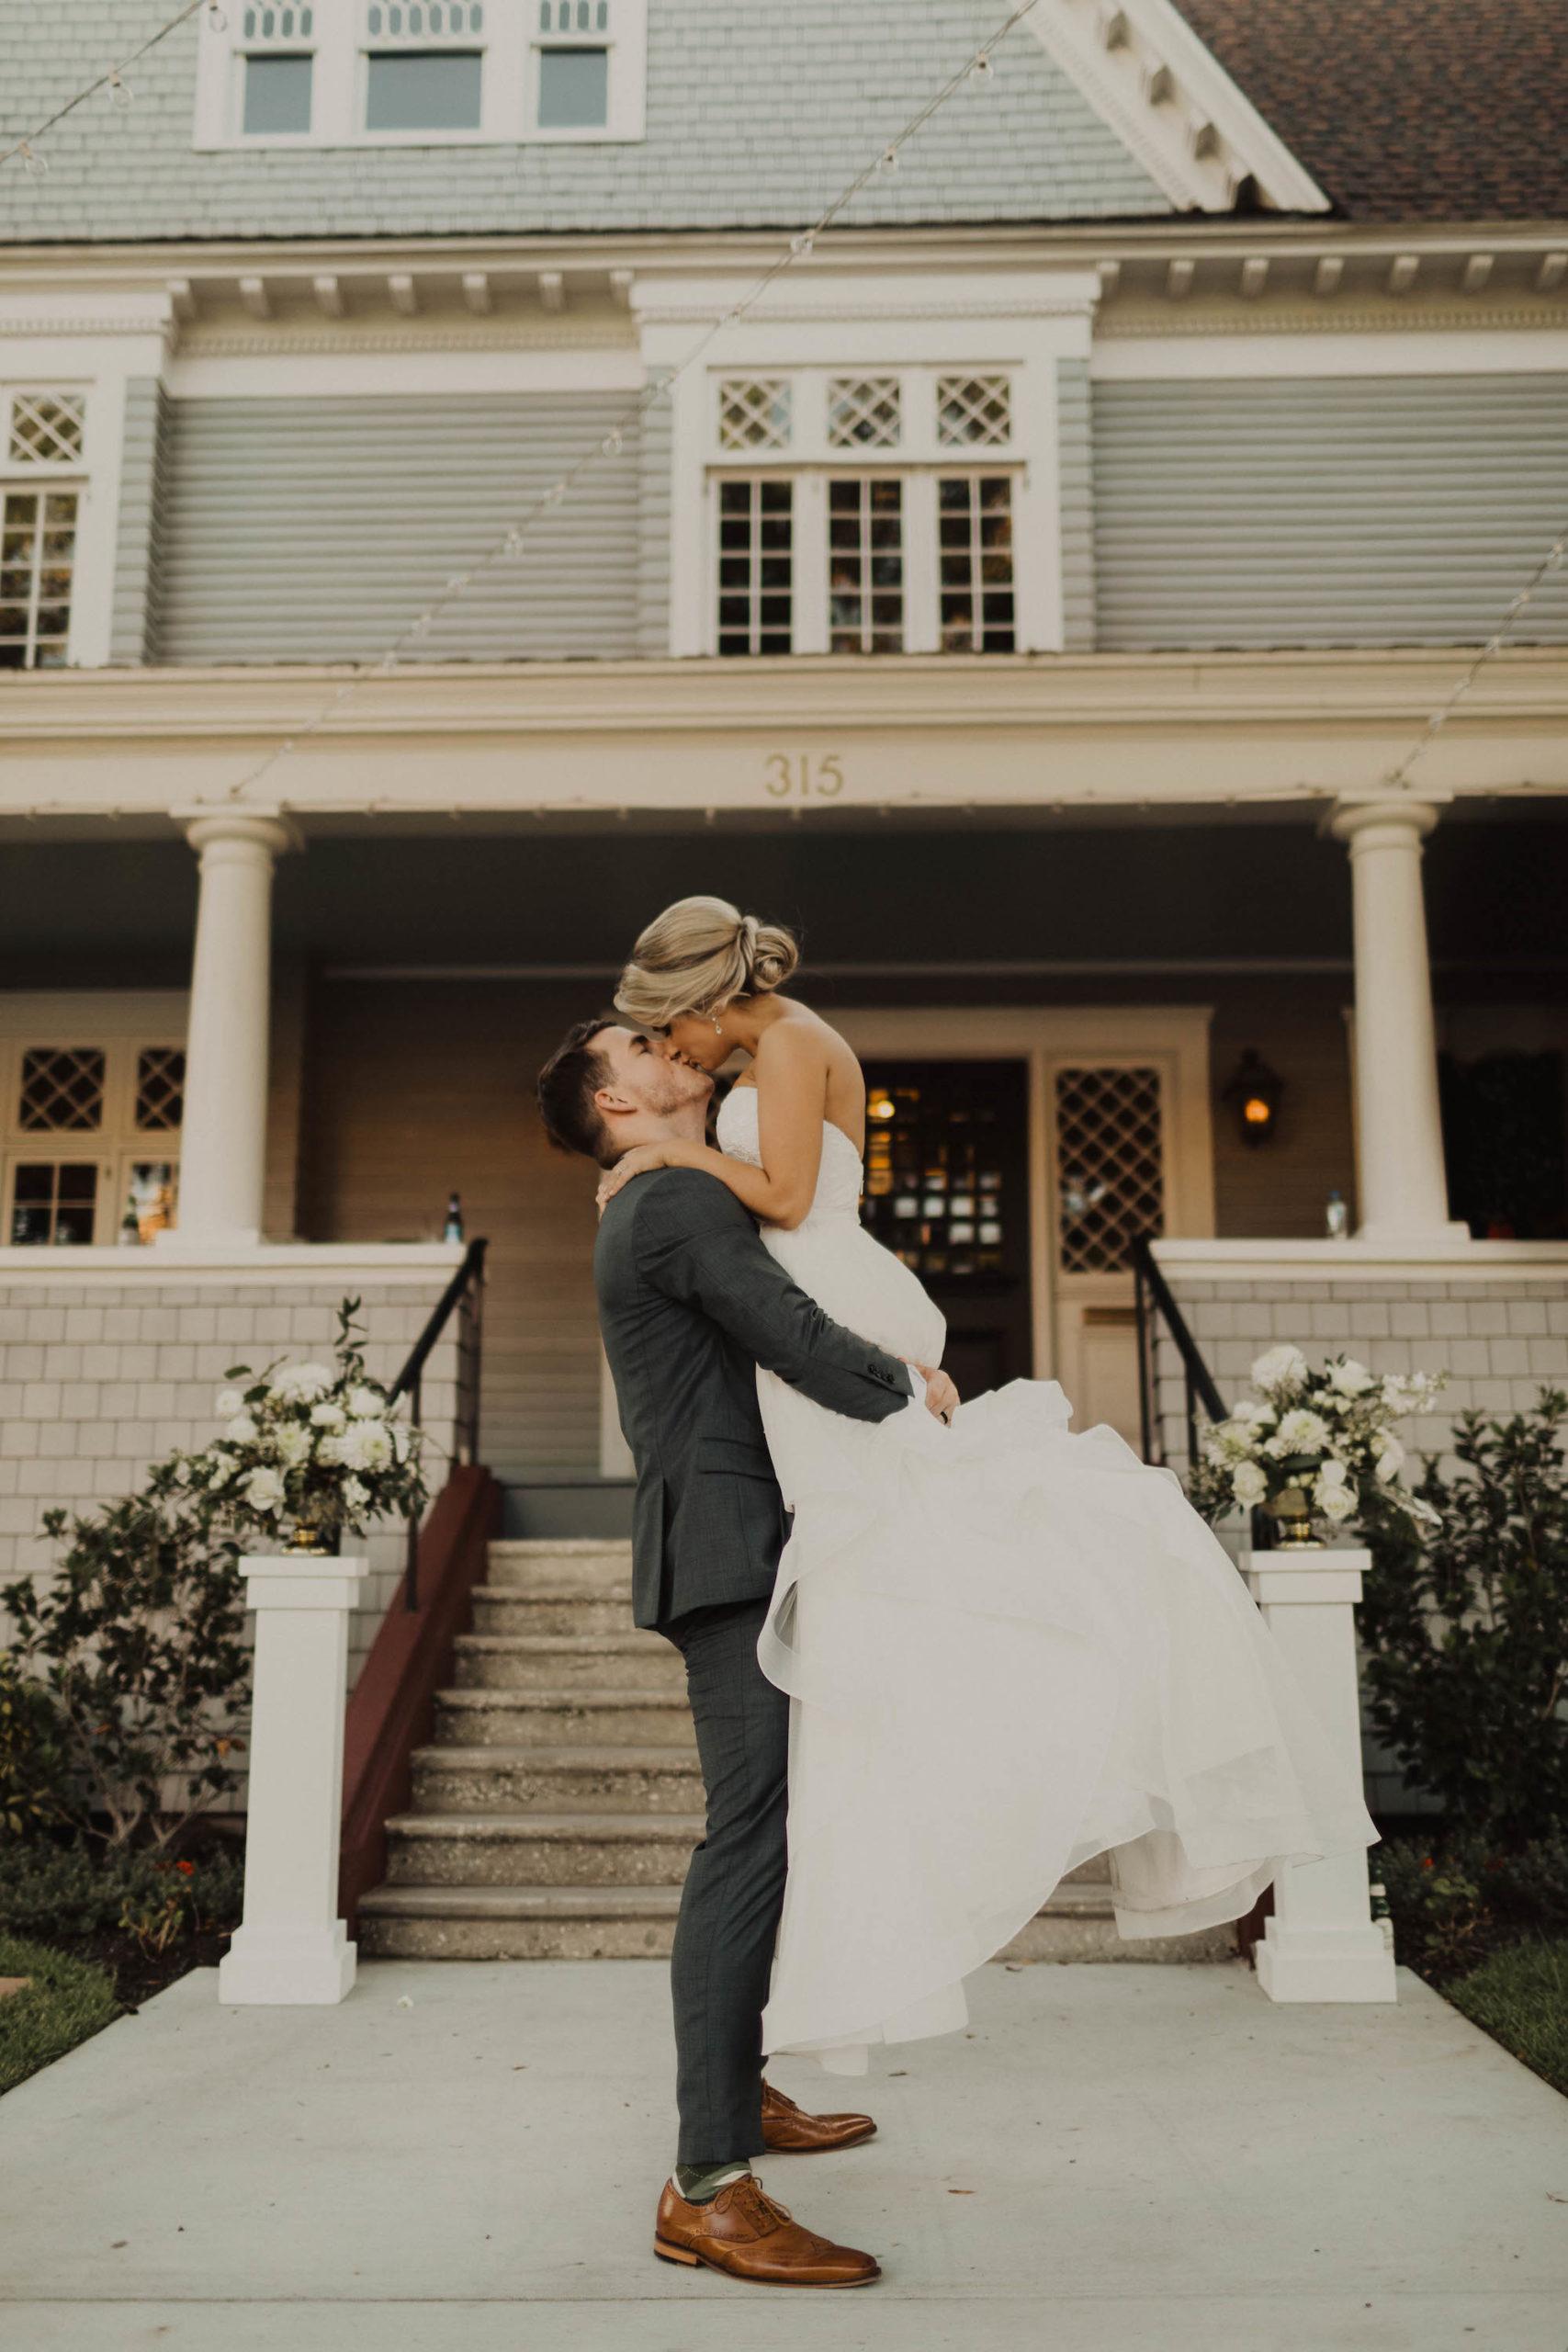 Romantic Bride and Groom Kissing Wedding Portrait Outside Tampa Bay Wedding Venue The Orlo